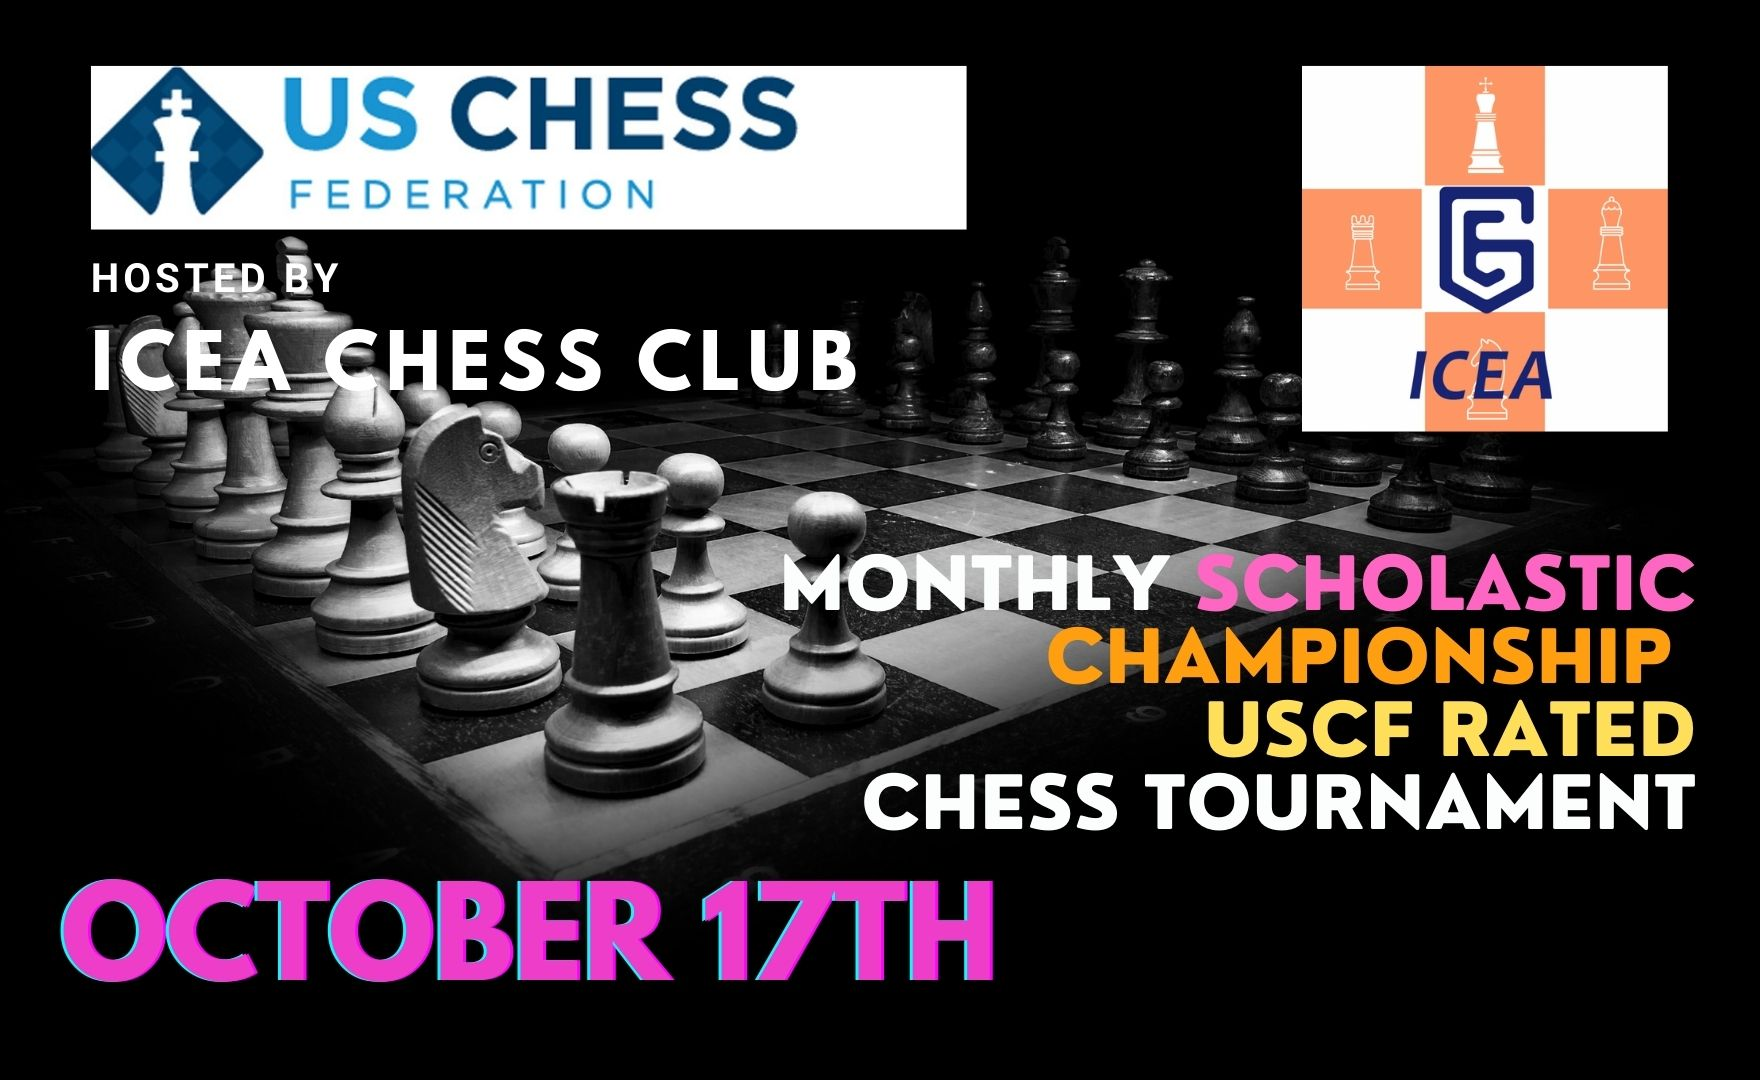 ICEA October Scholastic Championship Chess Tournament